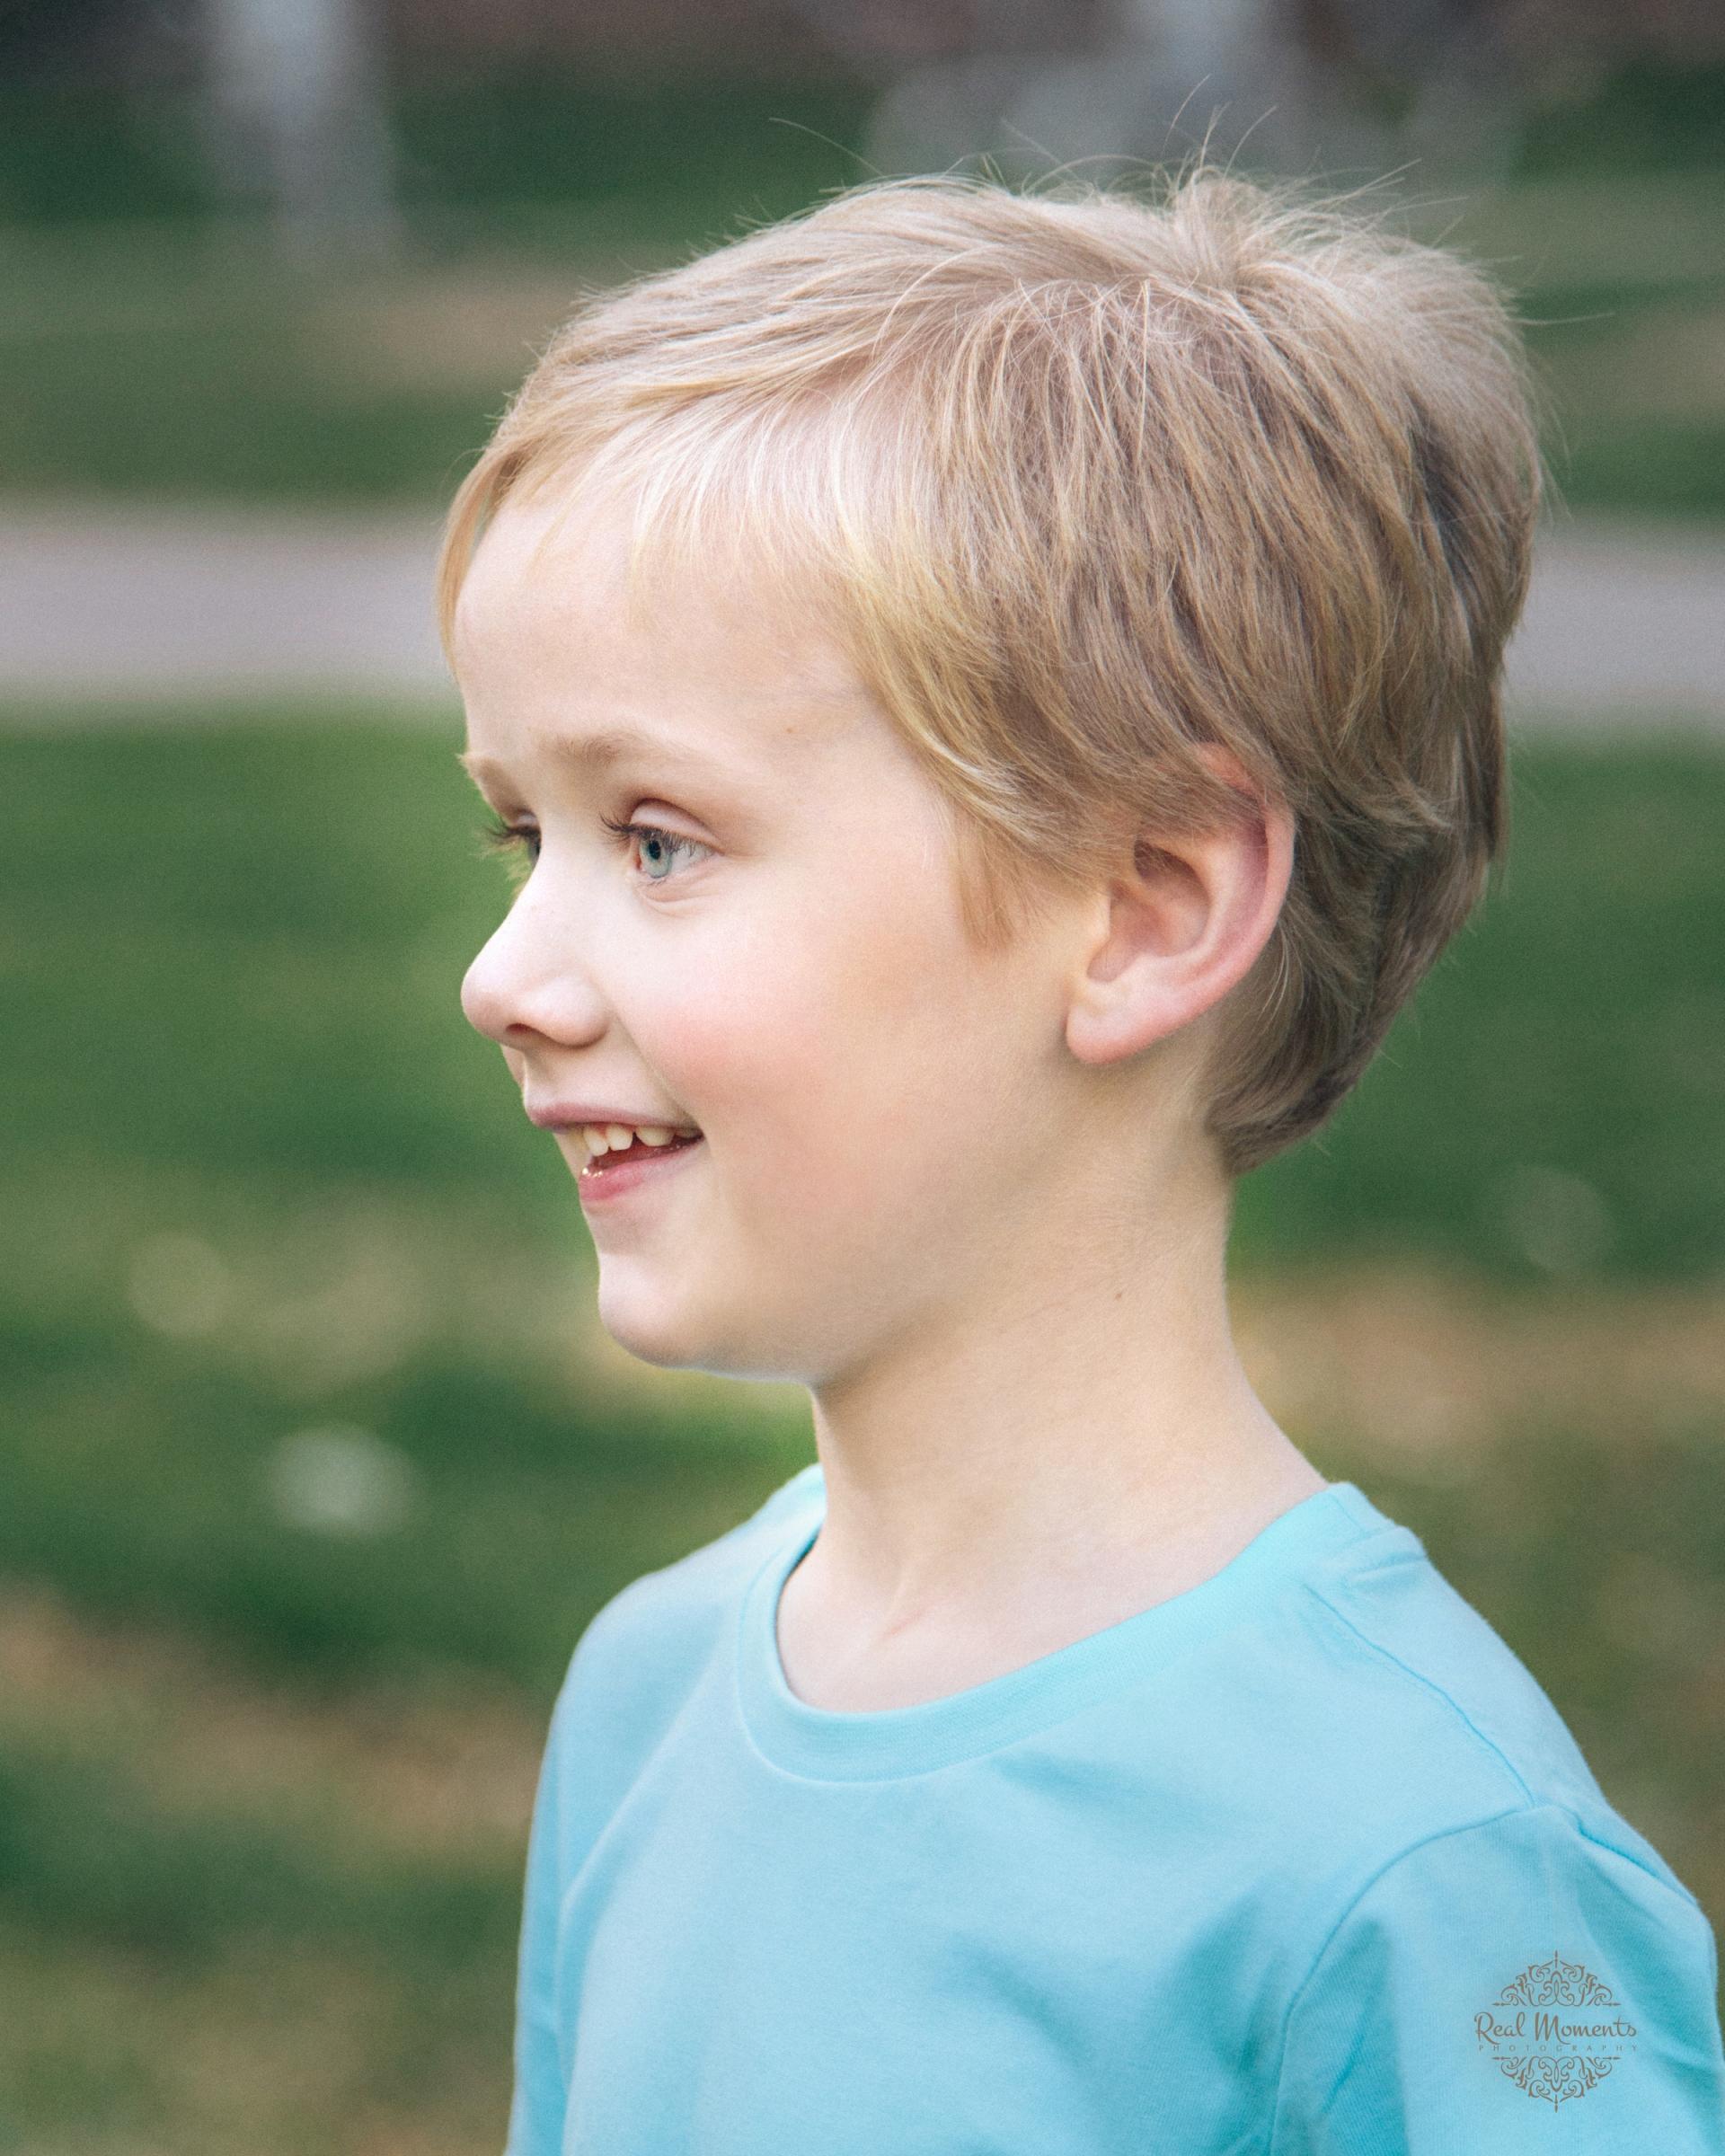 child portraiture - professional photographers Adelaide